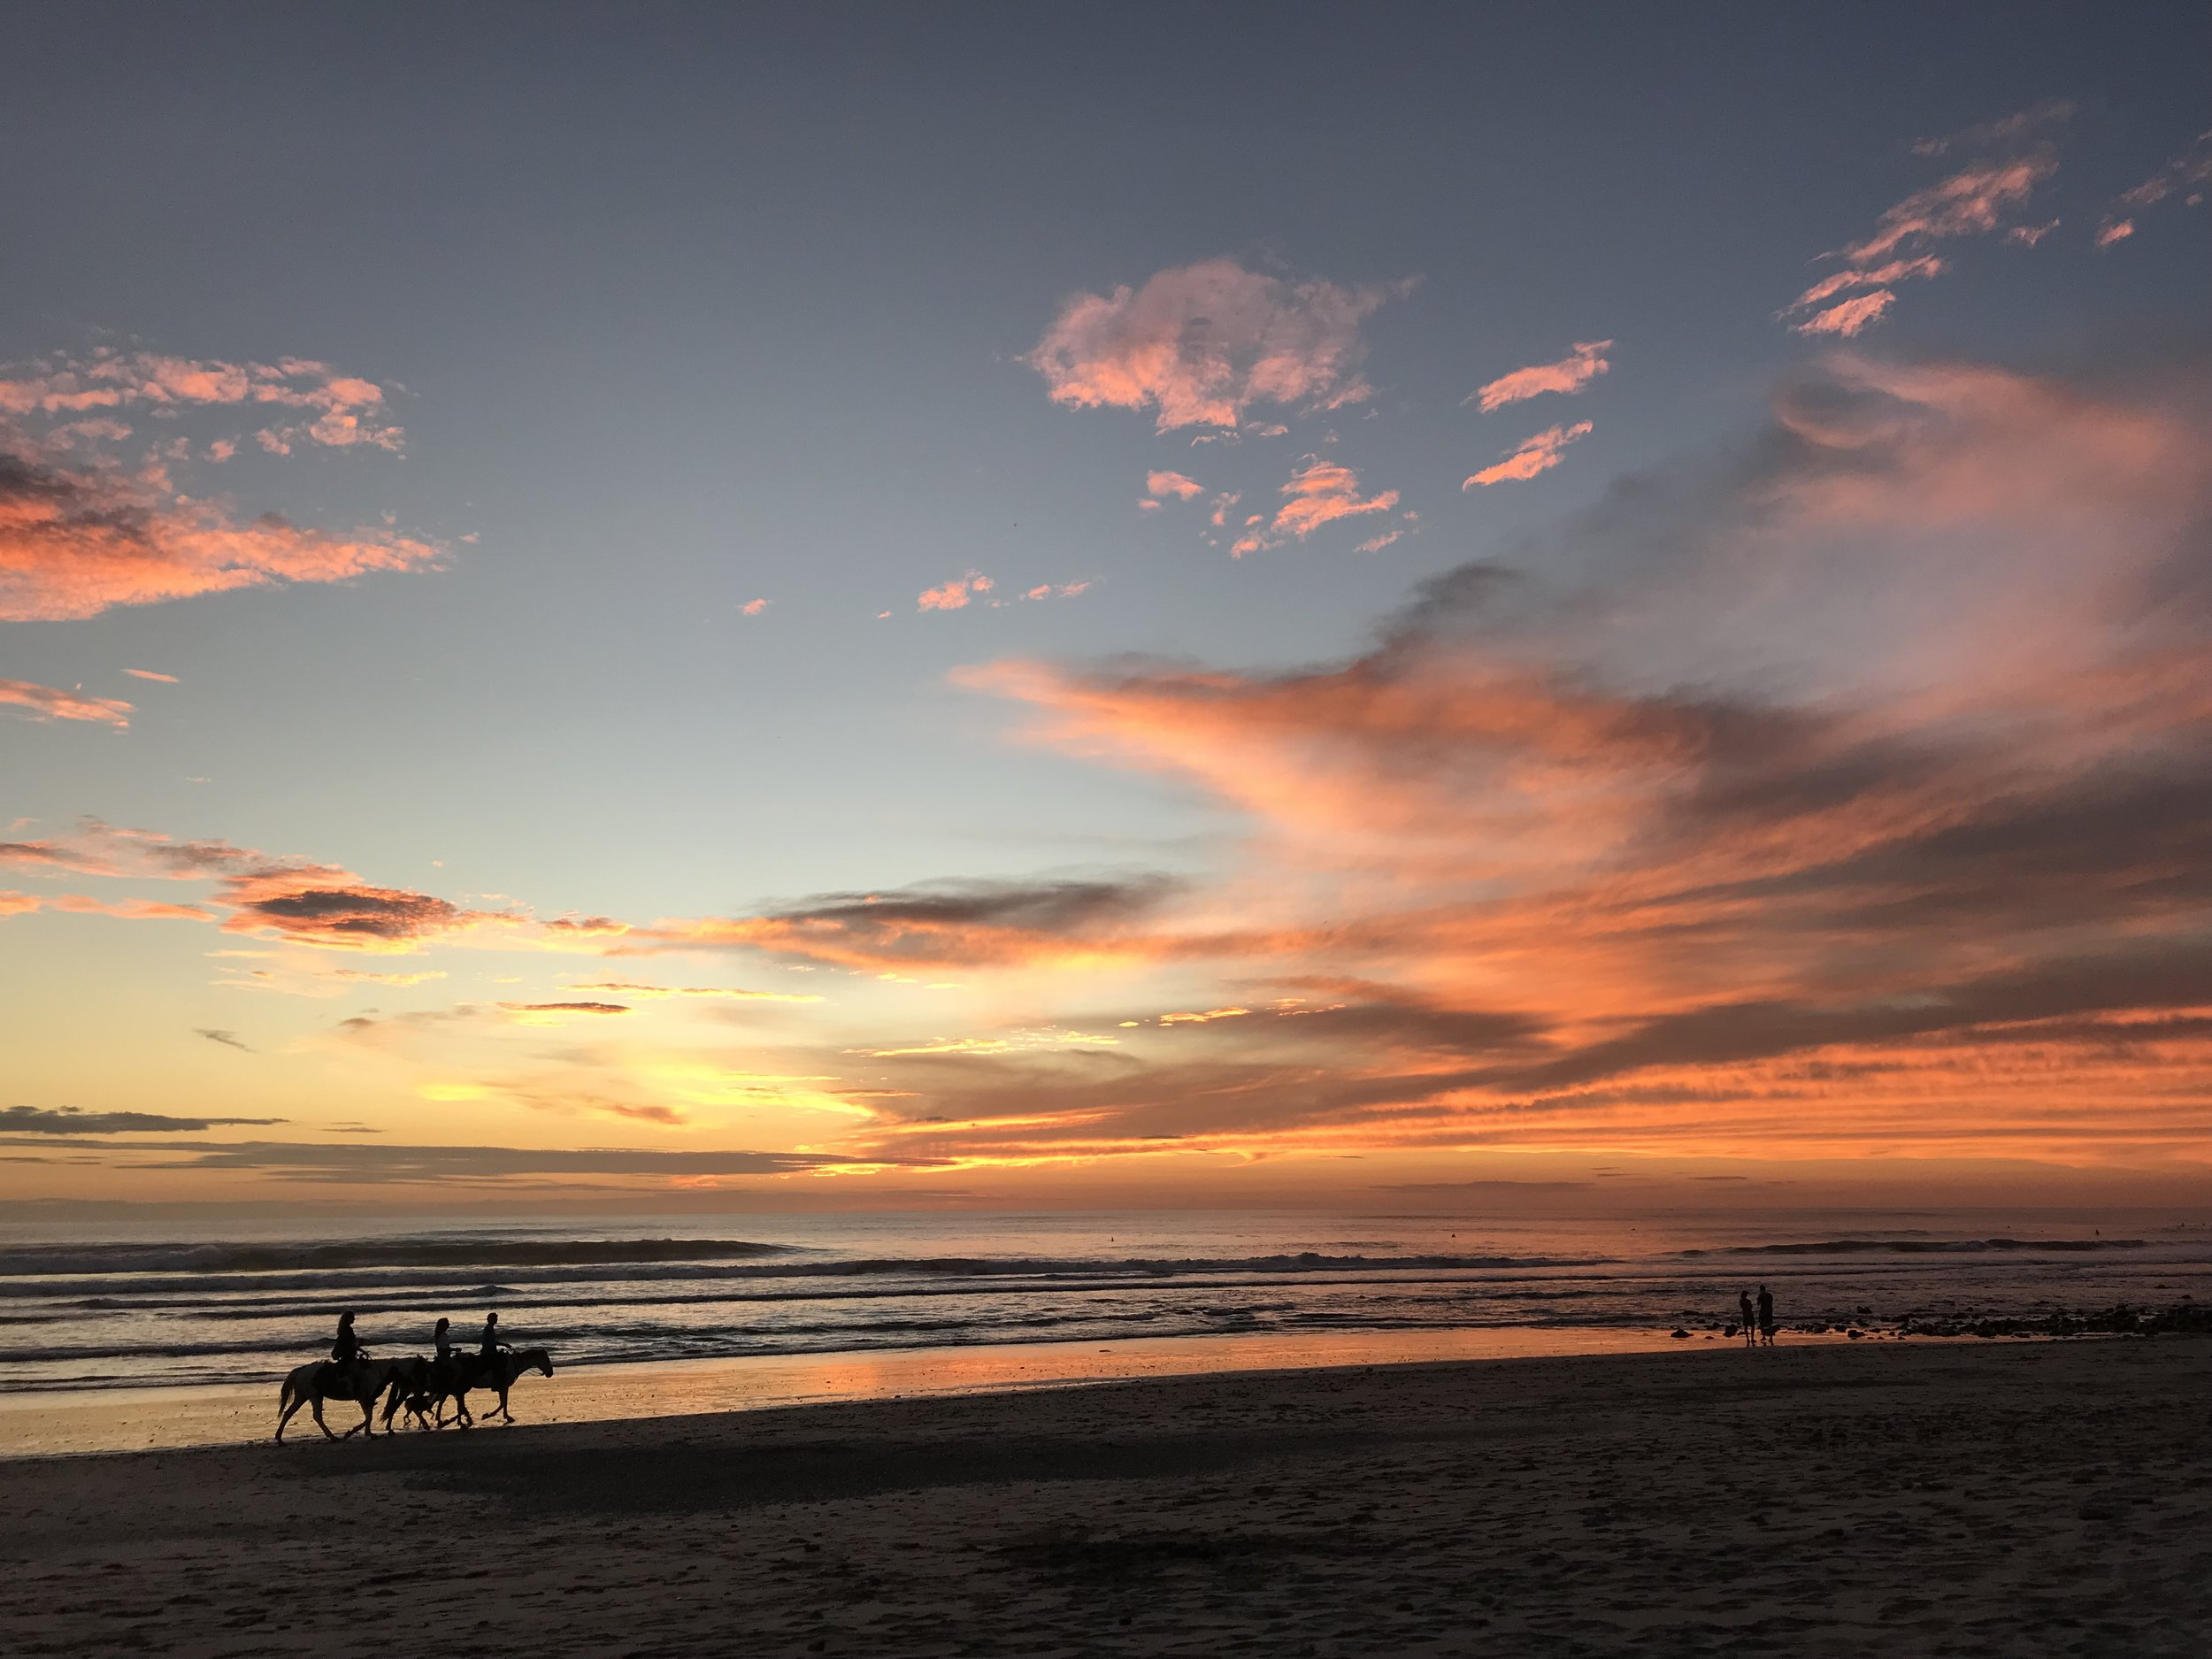 Tropico Latino_sunset Playa Carmen_IMG_7715.jpg